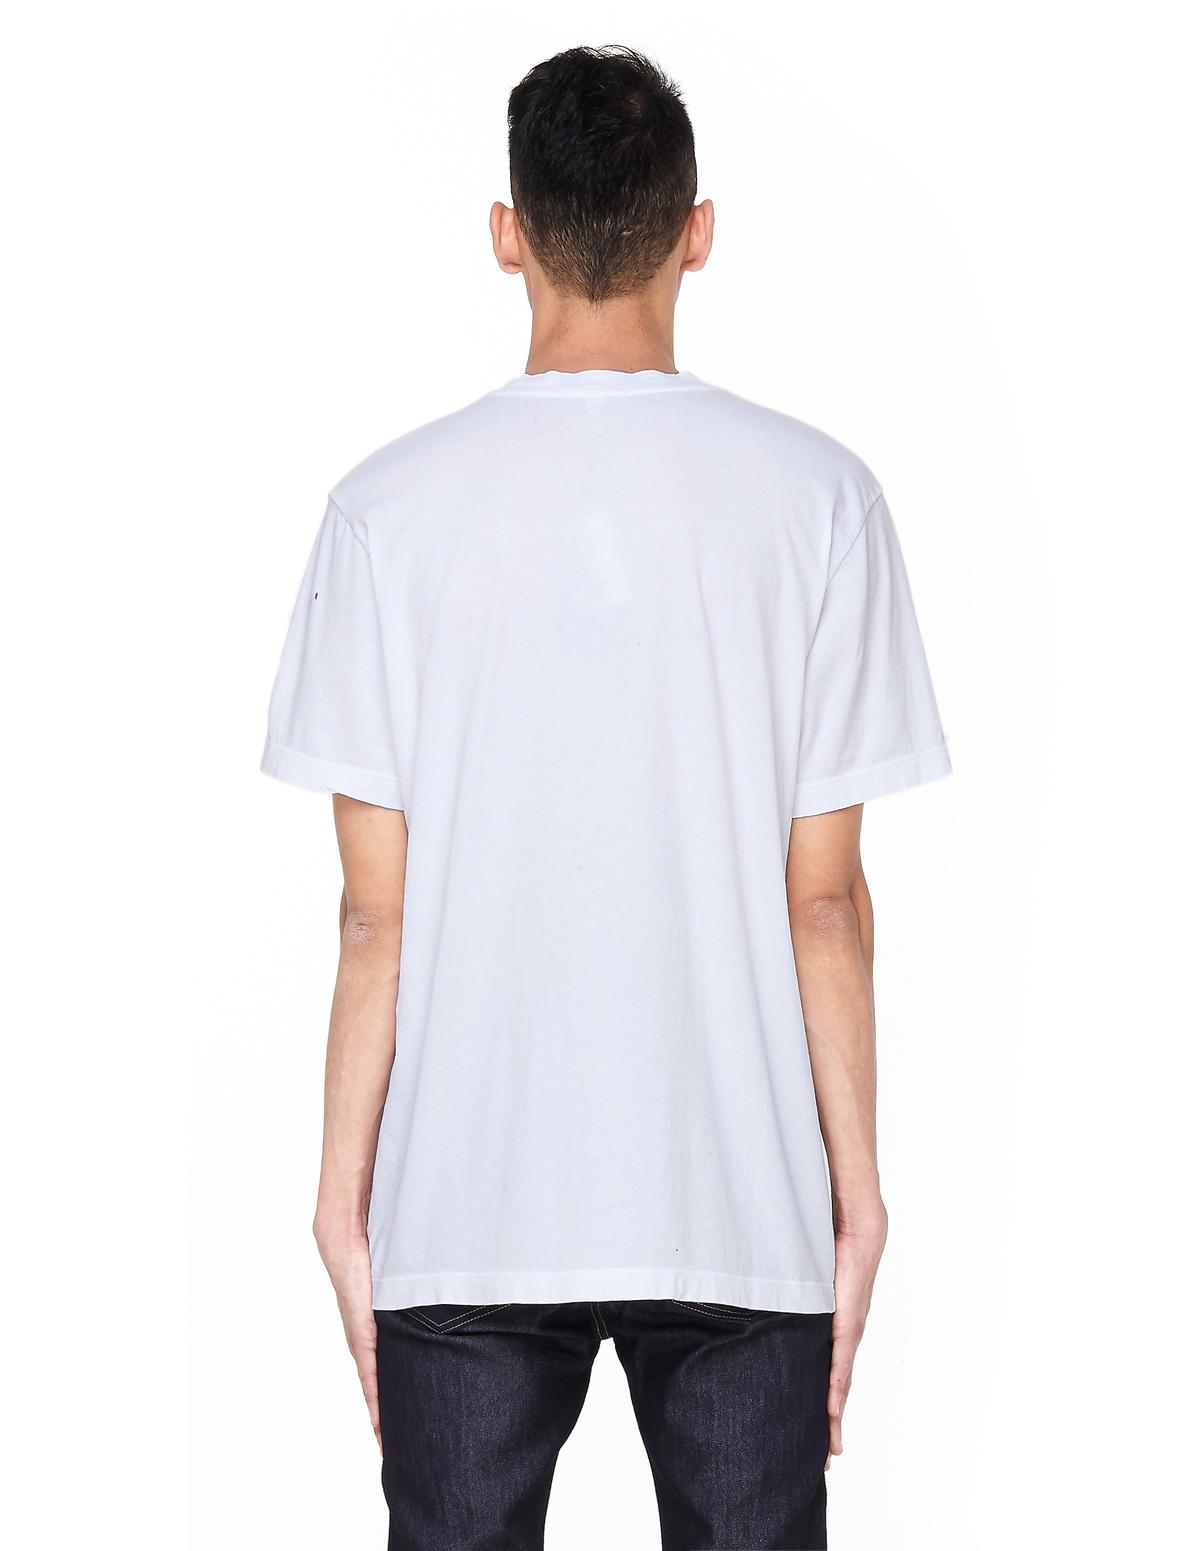 c8ee9982aee James Perse Cotton V-Neck T-Shirt - White   Garmentory